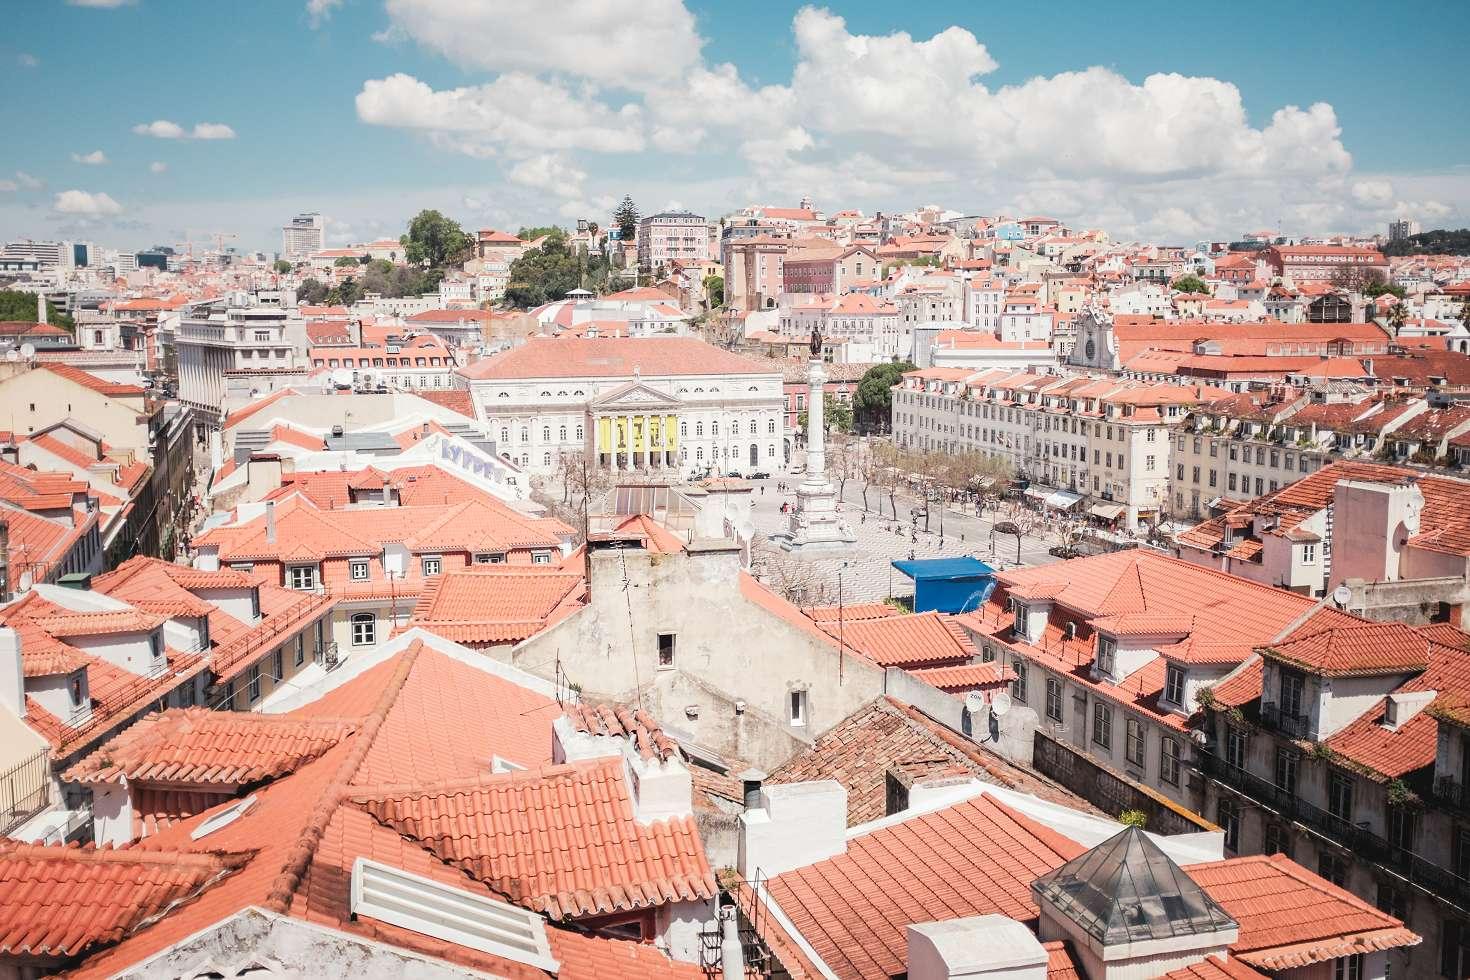 Valencia-Lissabon-Vigo-Stonehenge (33)